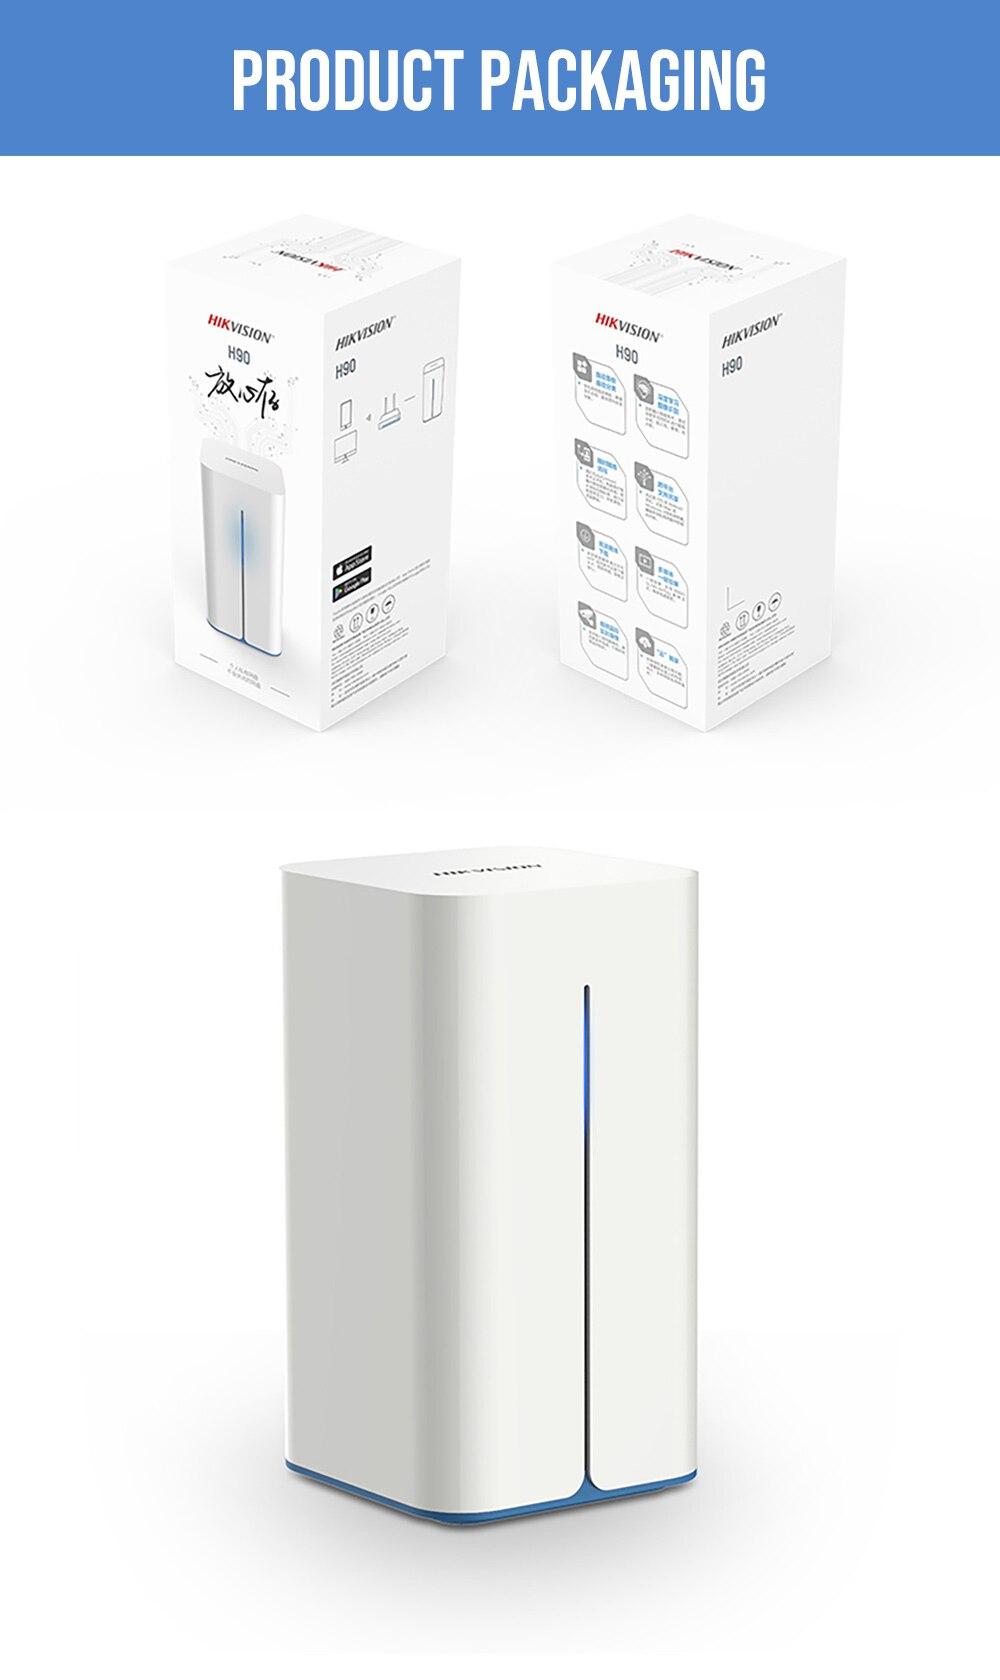 HIKVISON NAS Network-Cloud-Storage Mobile-Network H90 Smart USB USB2.0